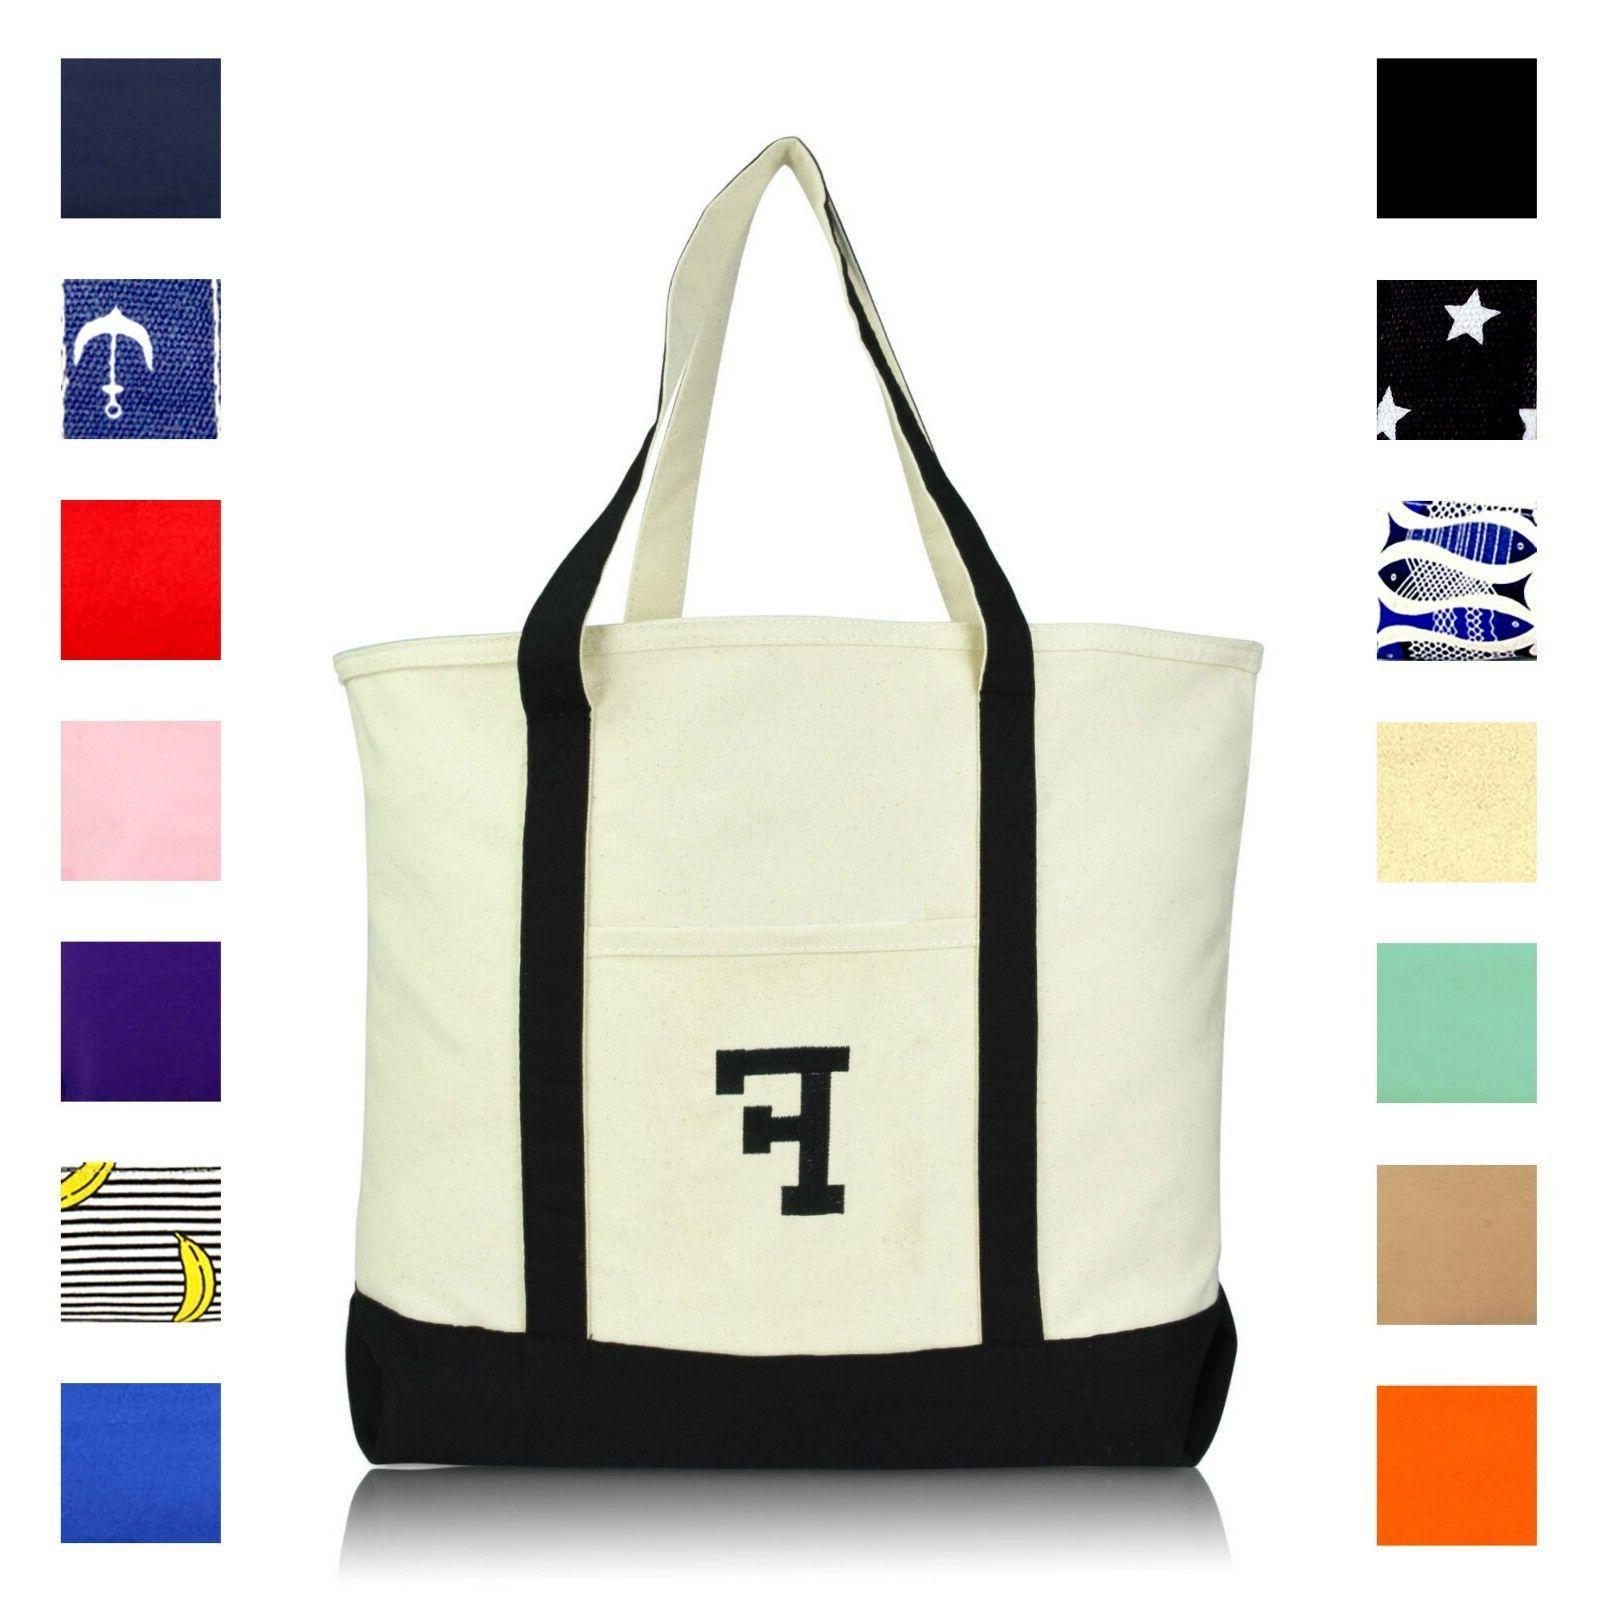 initial tote bag personalized monogram zippered top